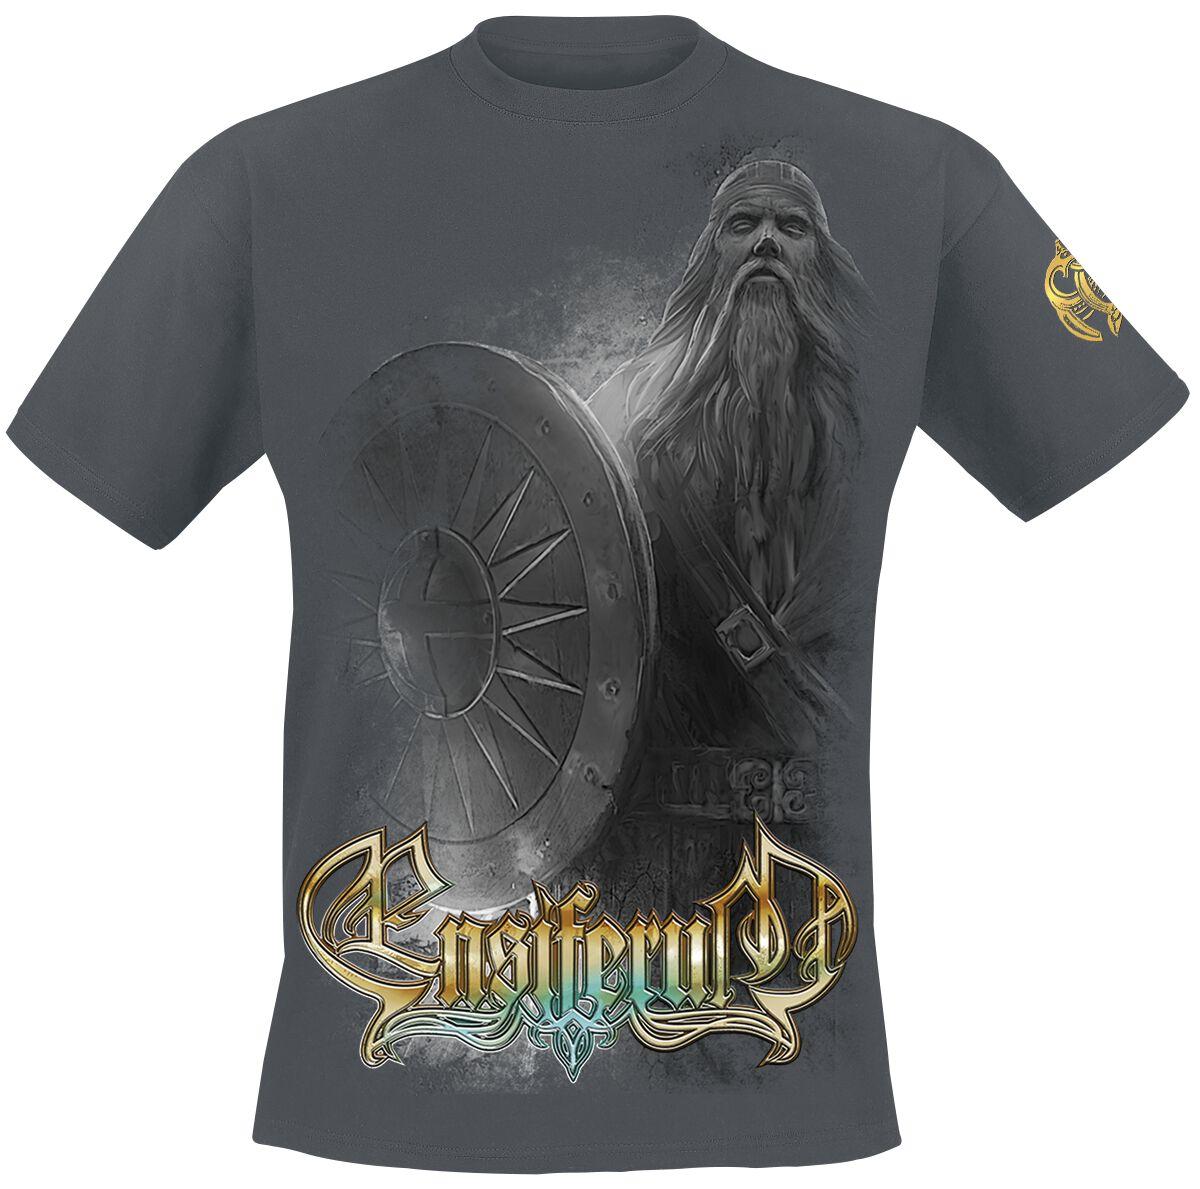 Zespoły - Koszulki - T-Shirt Ensiferum Two paths - shield T-Shirt ciemnoszary - 375880